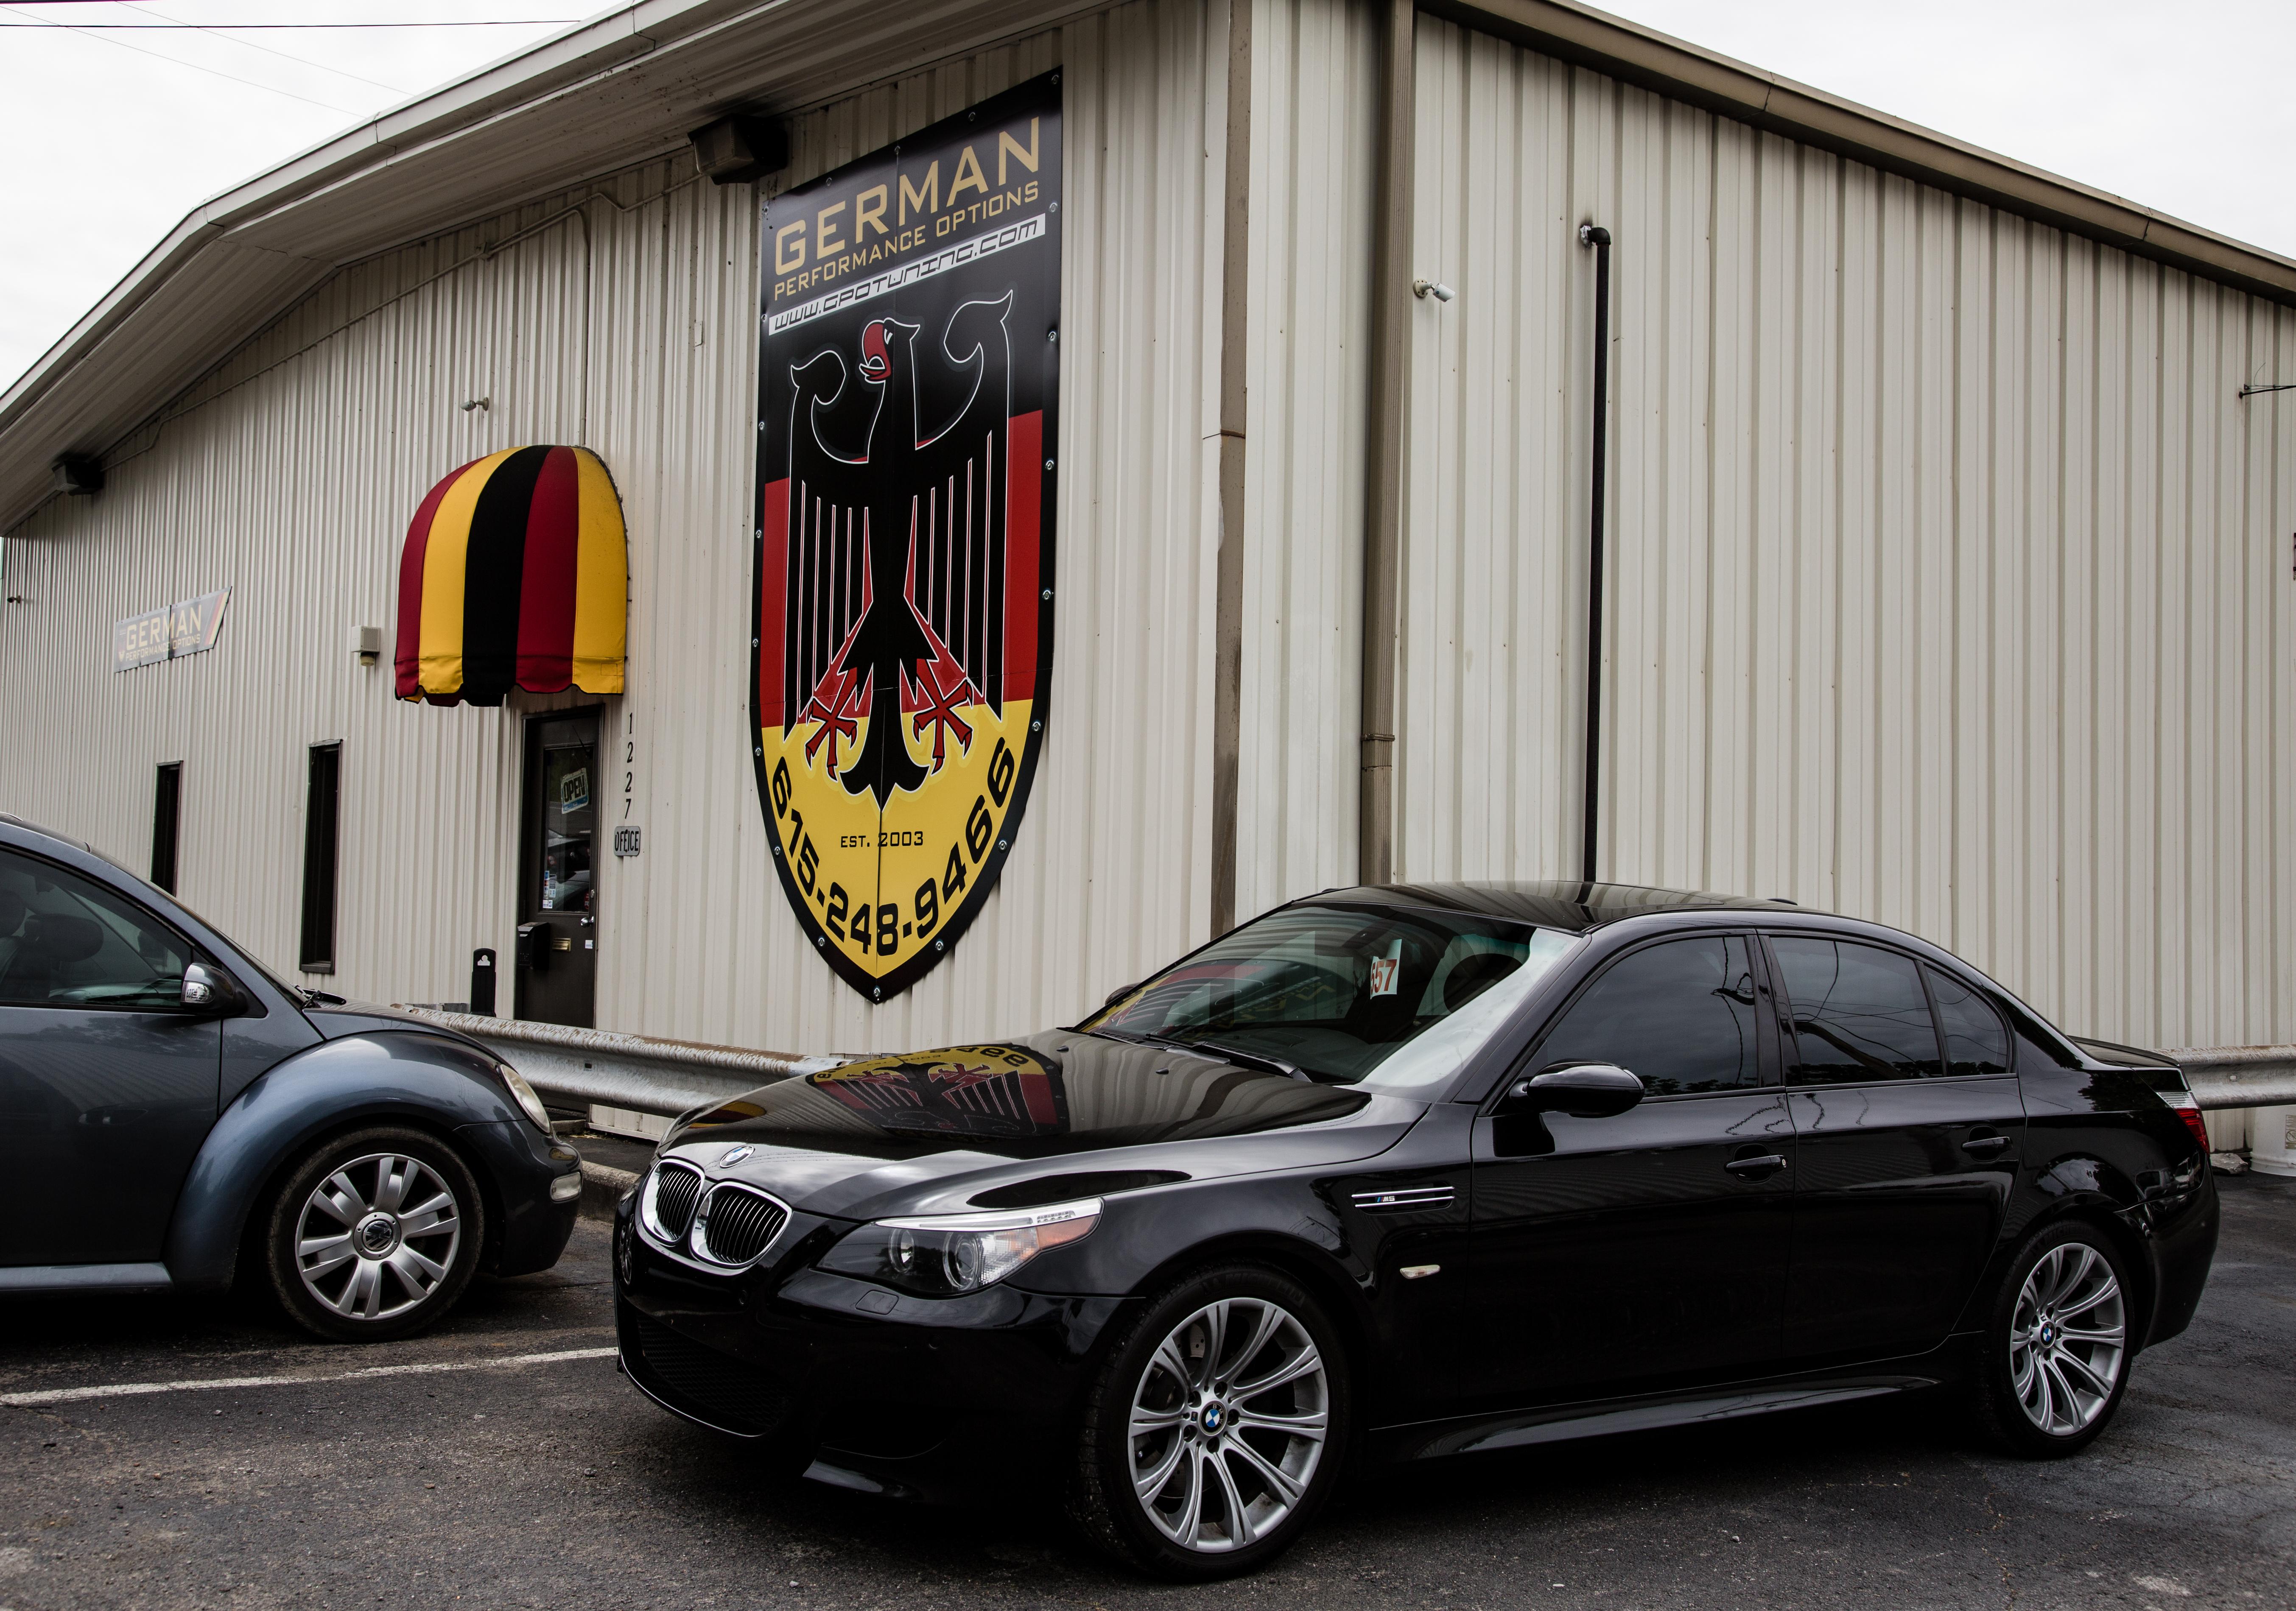 Volkswagen Audi Bmw Repair Service And Performance In